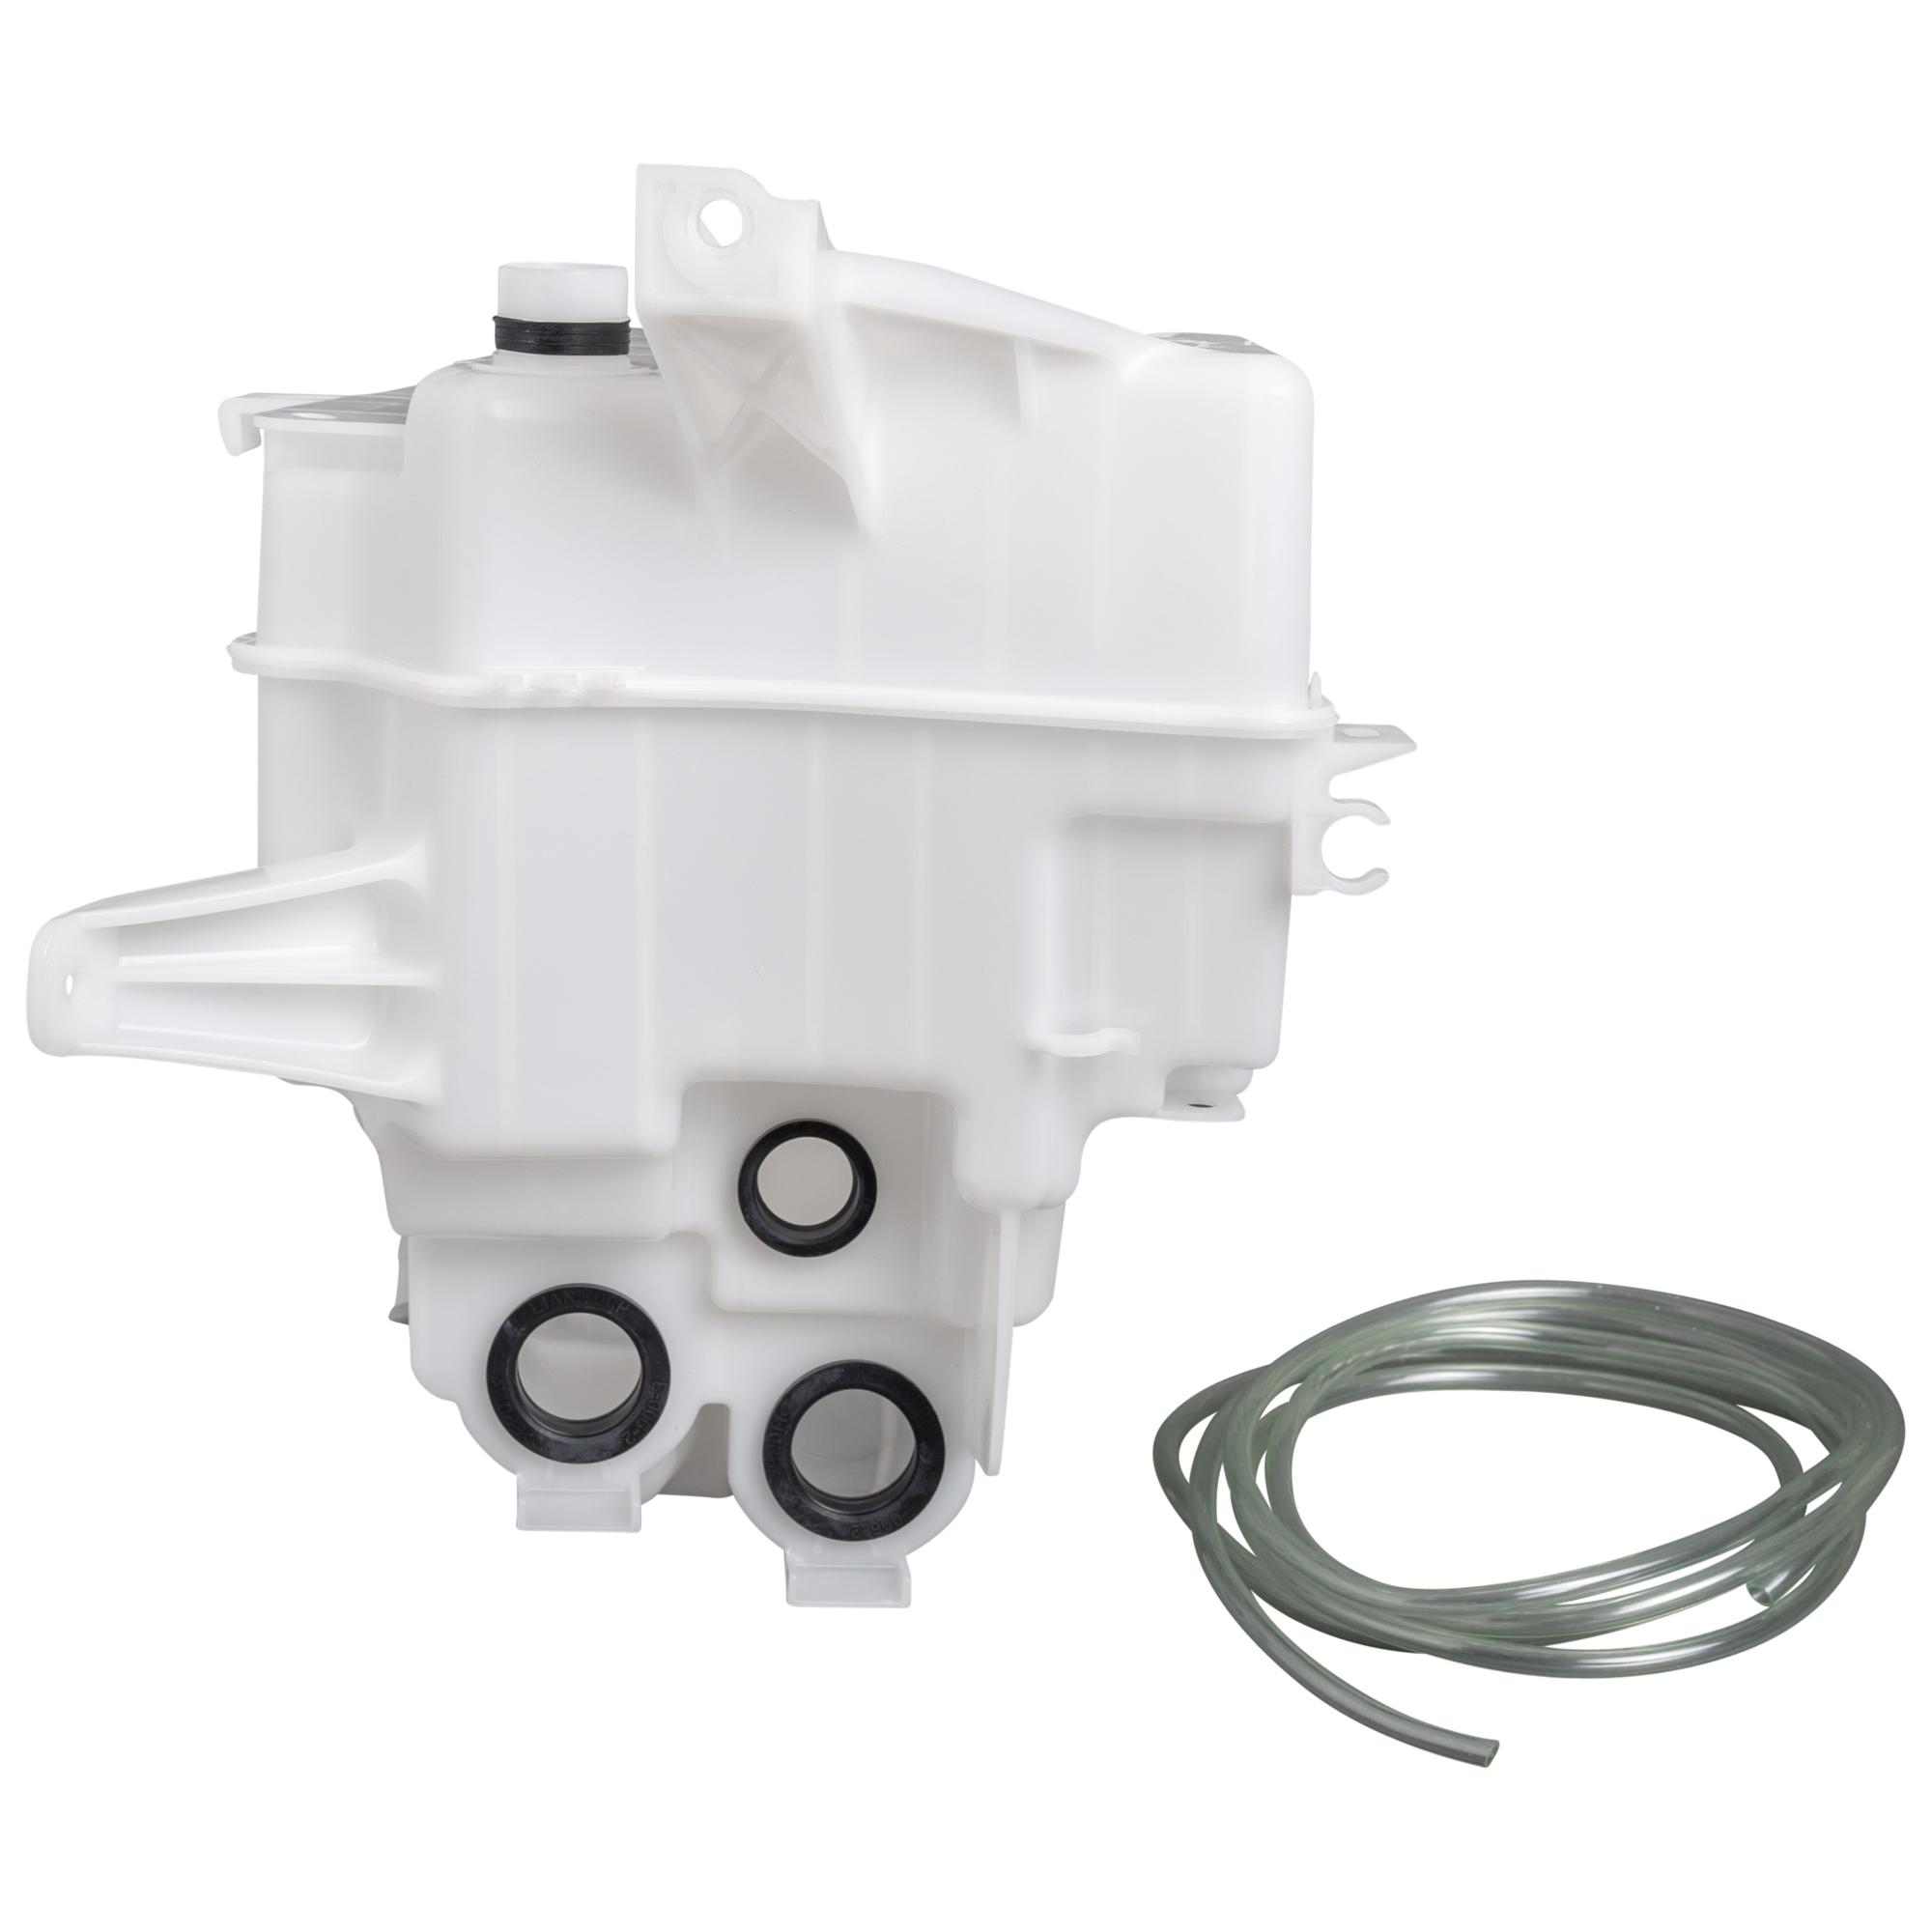 w//pump /& cap Washer Reservoir For 92-93 Toyota Camry Sedan Model